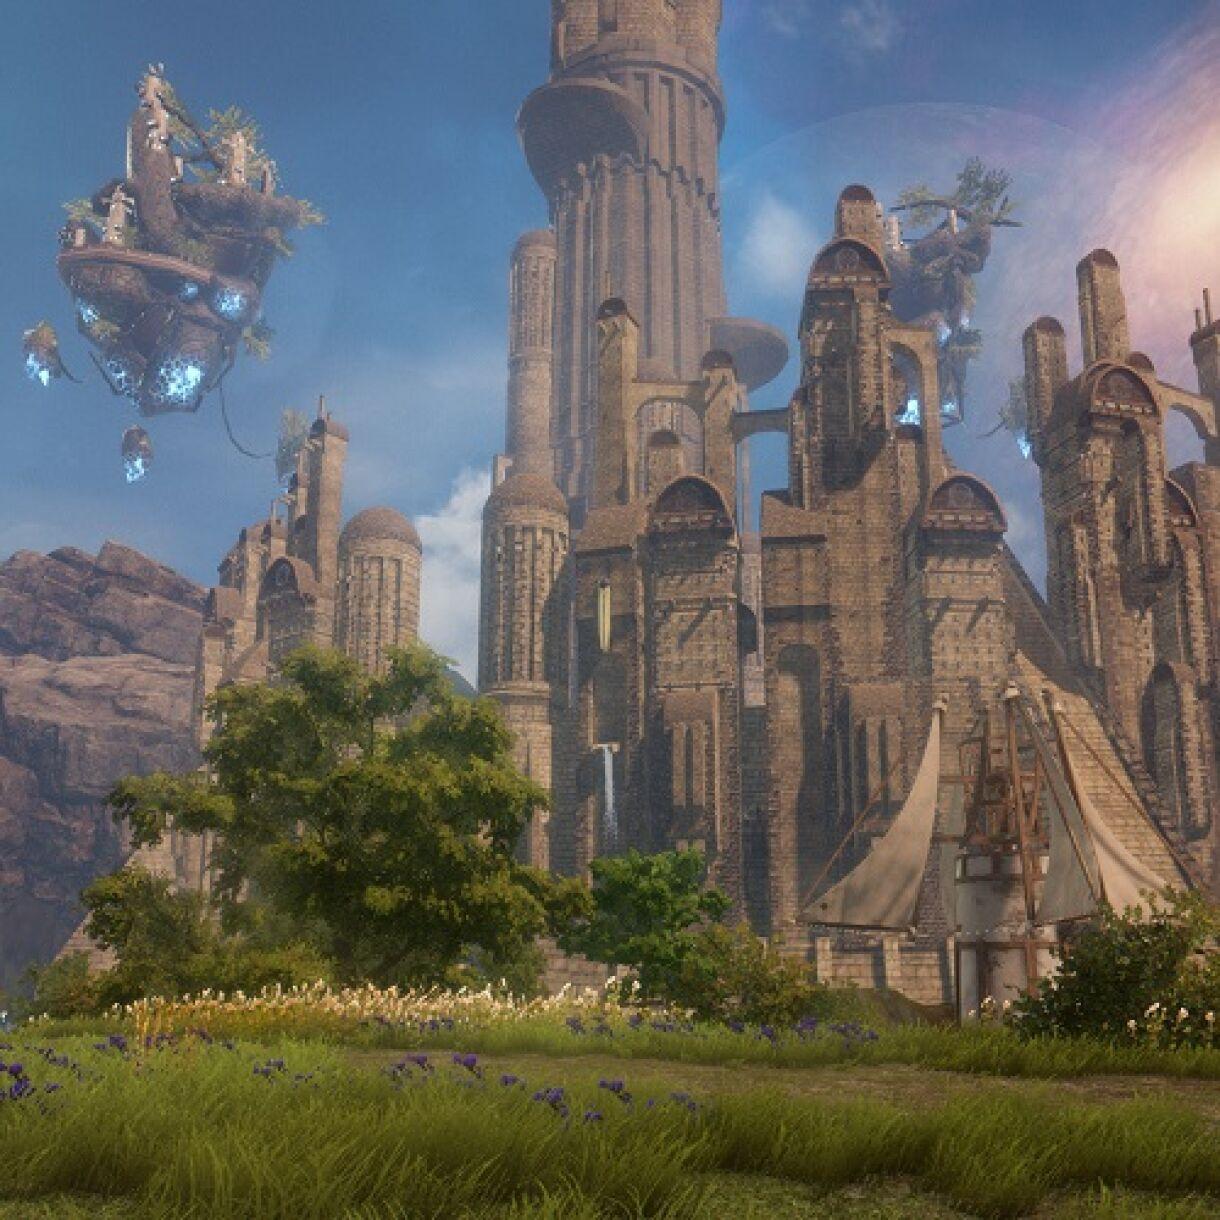 Edge of Eternity: Developing The World of JRPG